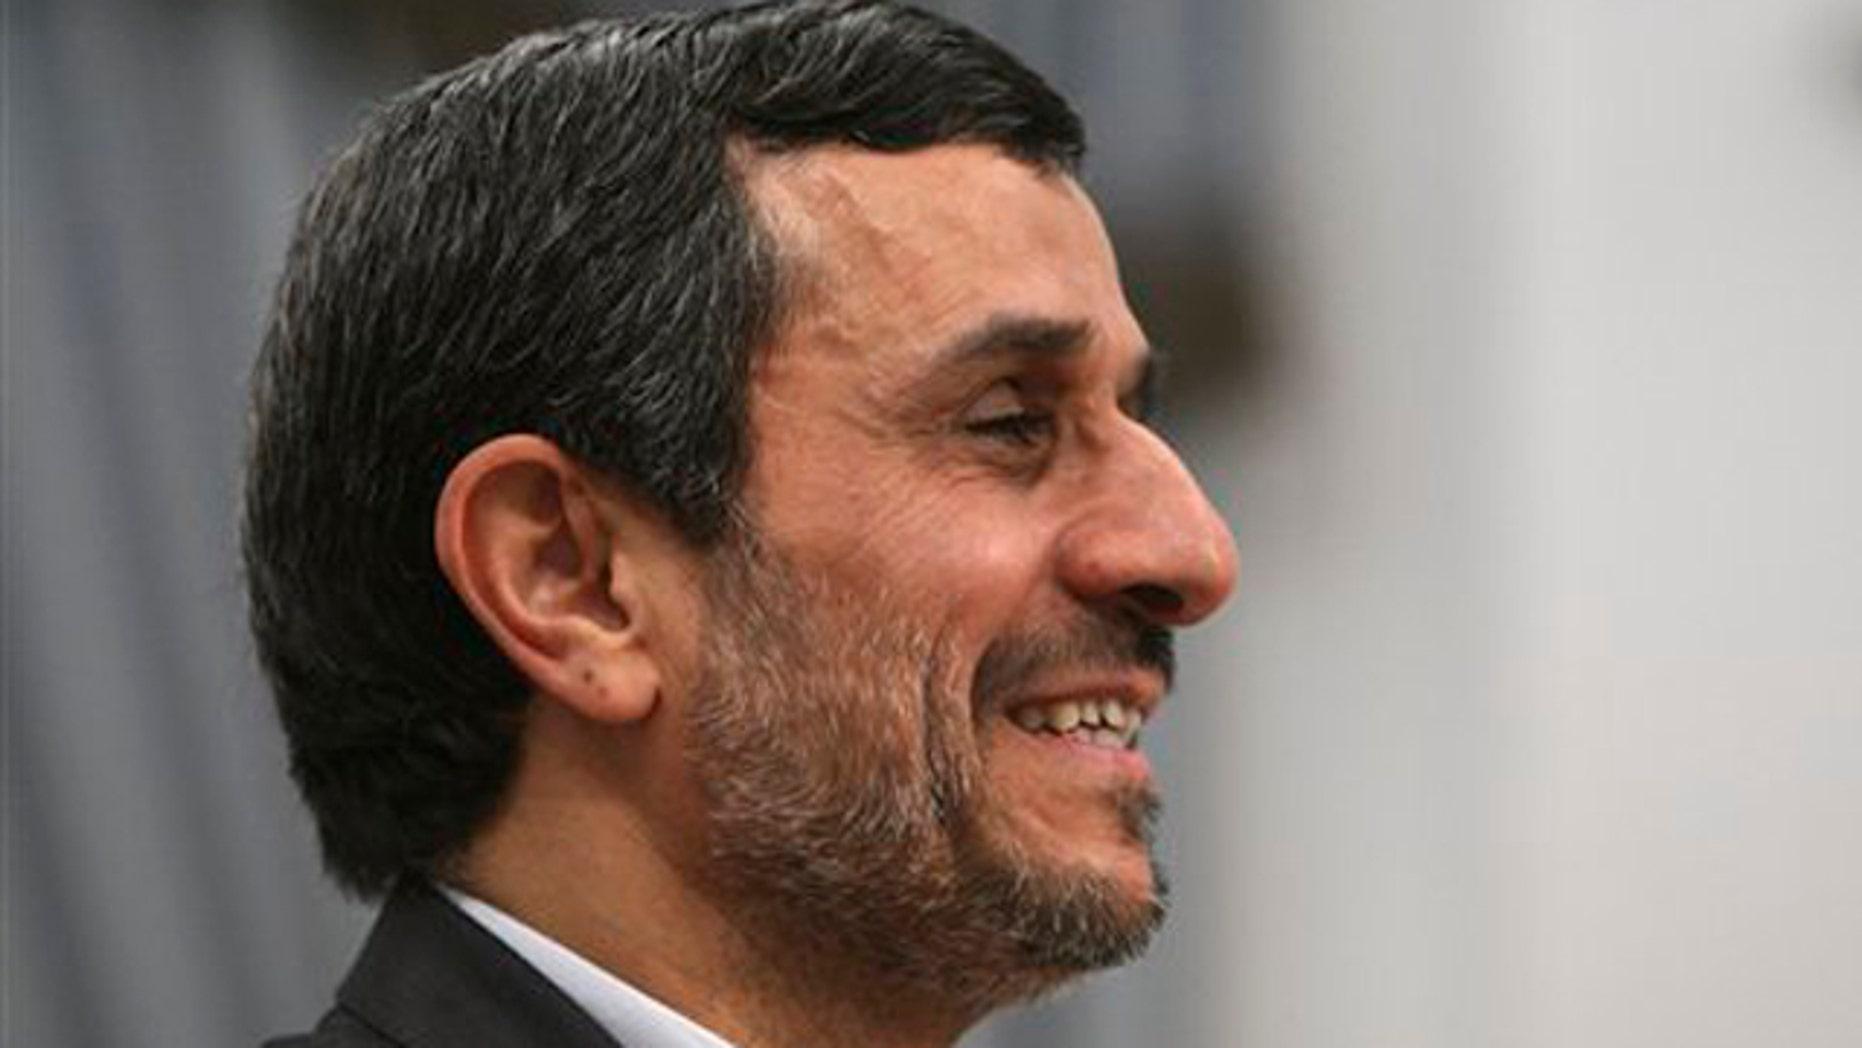 Dec. 13, 2011: Iranian President Mahmoud Ahmadinejad, smiles, prior to a meeting at the presidency office in Tehran, Iran.